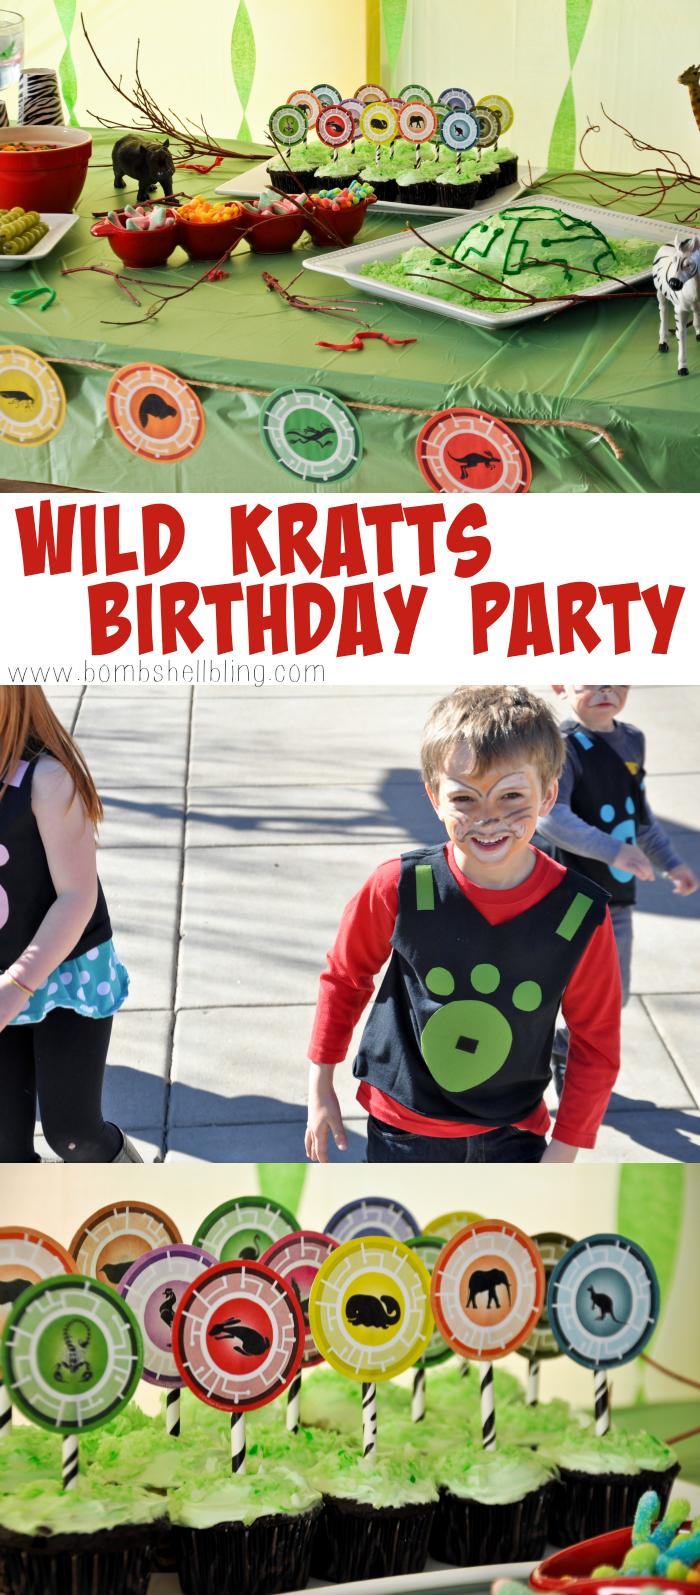 Wild kratts party games